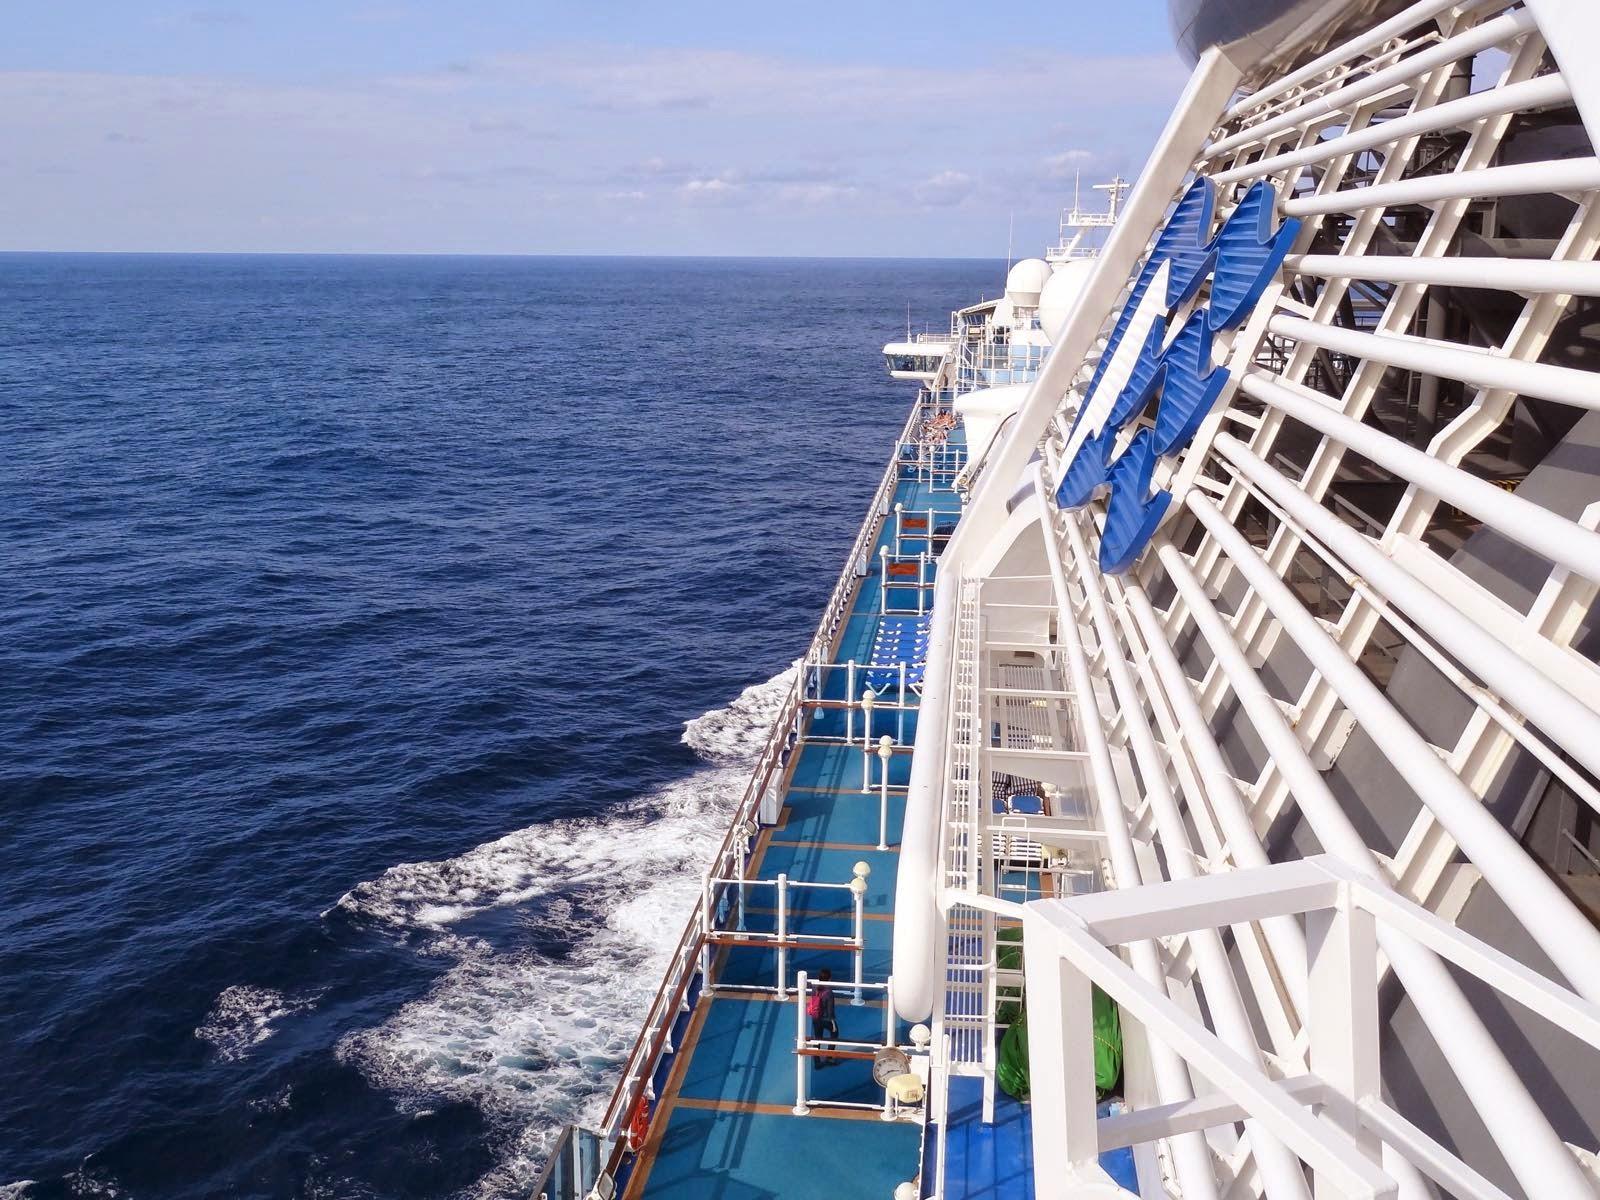 Deck 18 looking forward